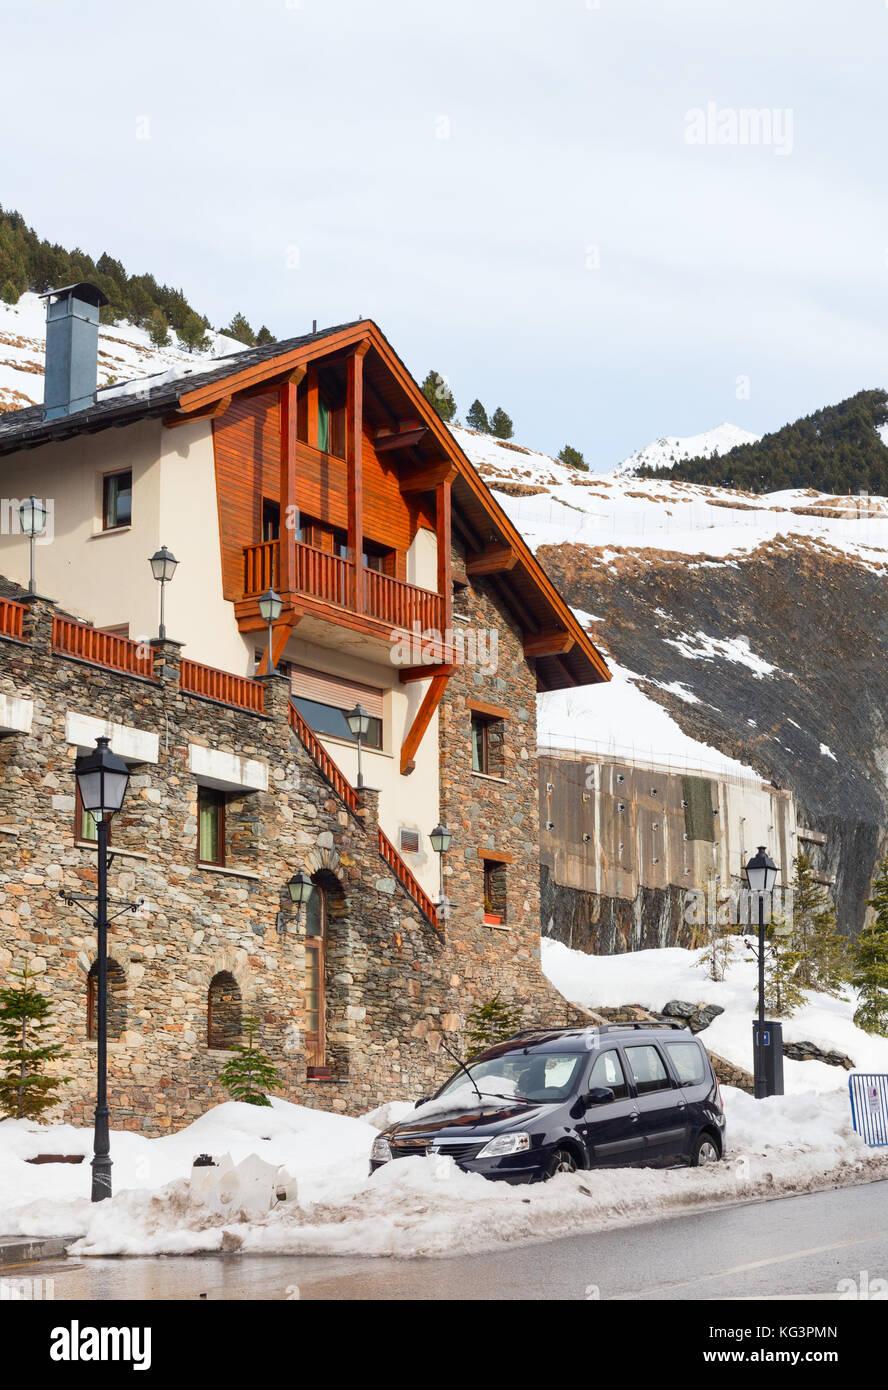 All-Mountain in Switzerland